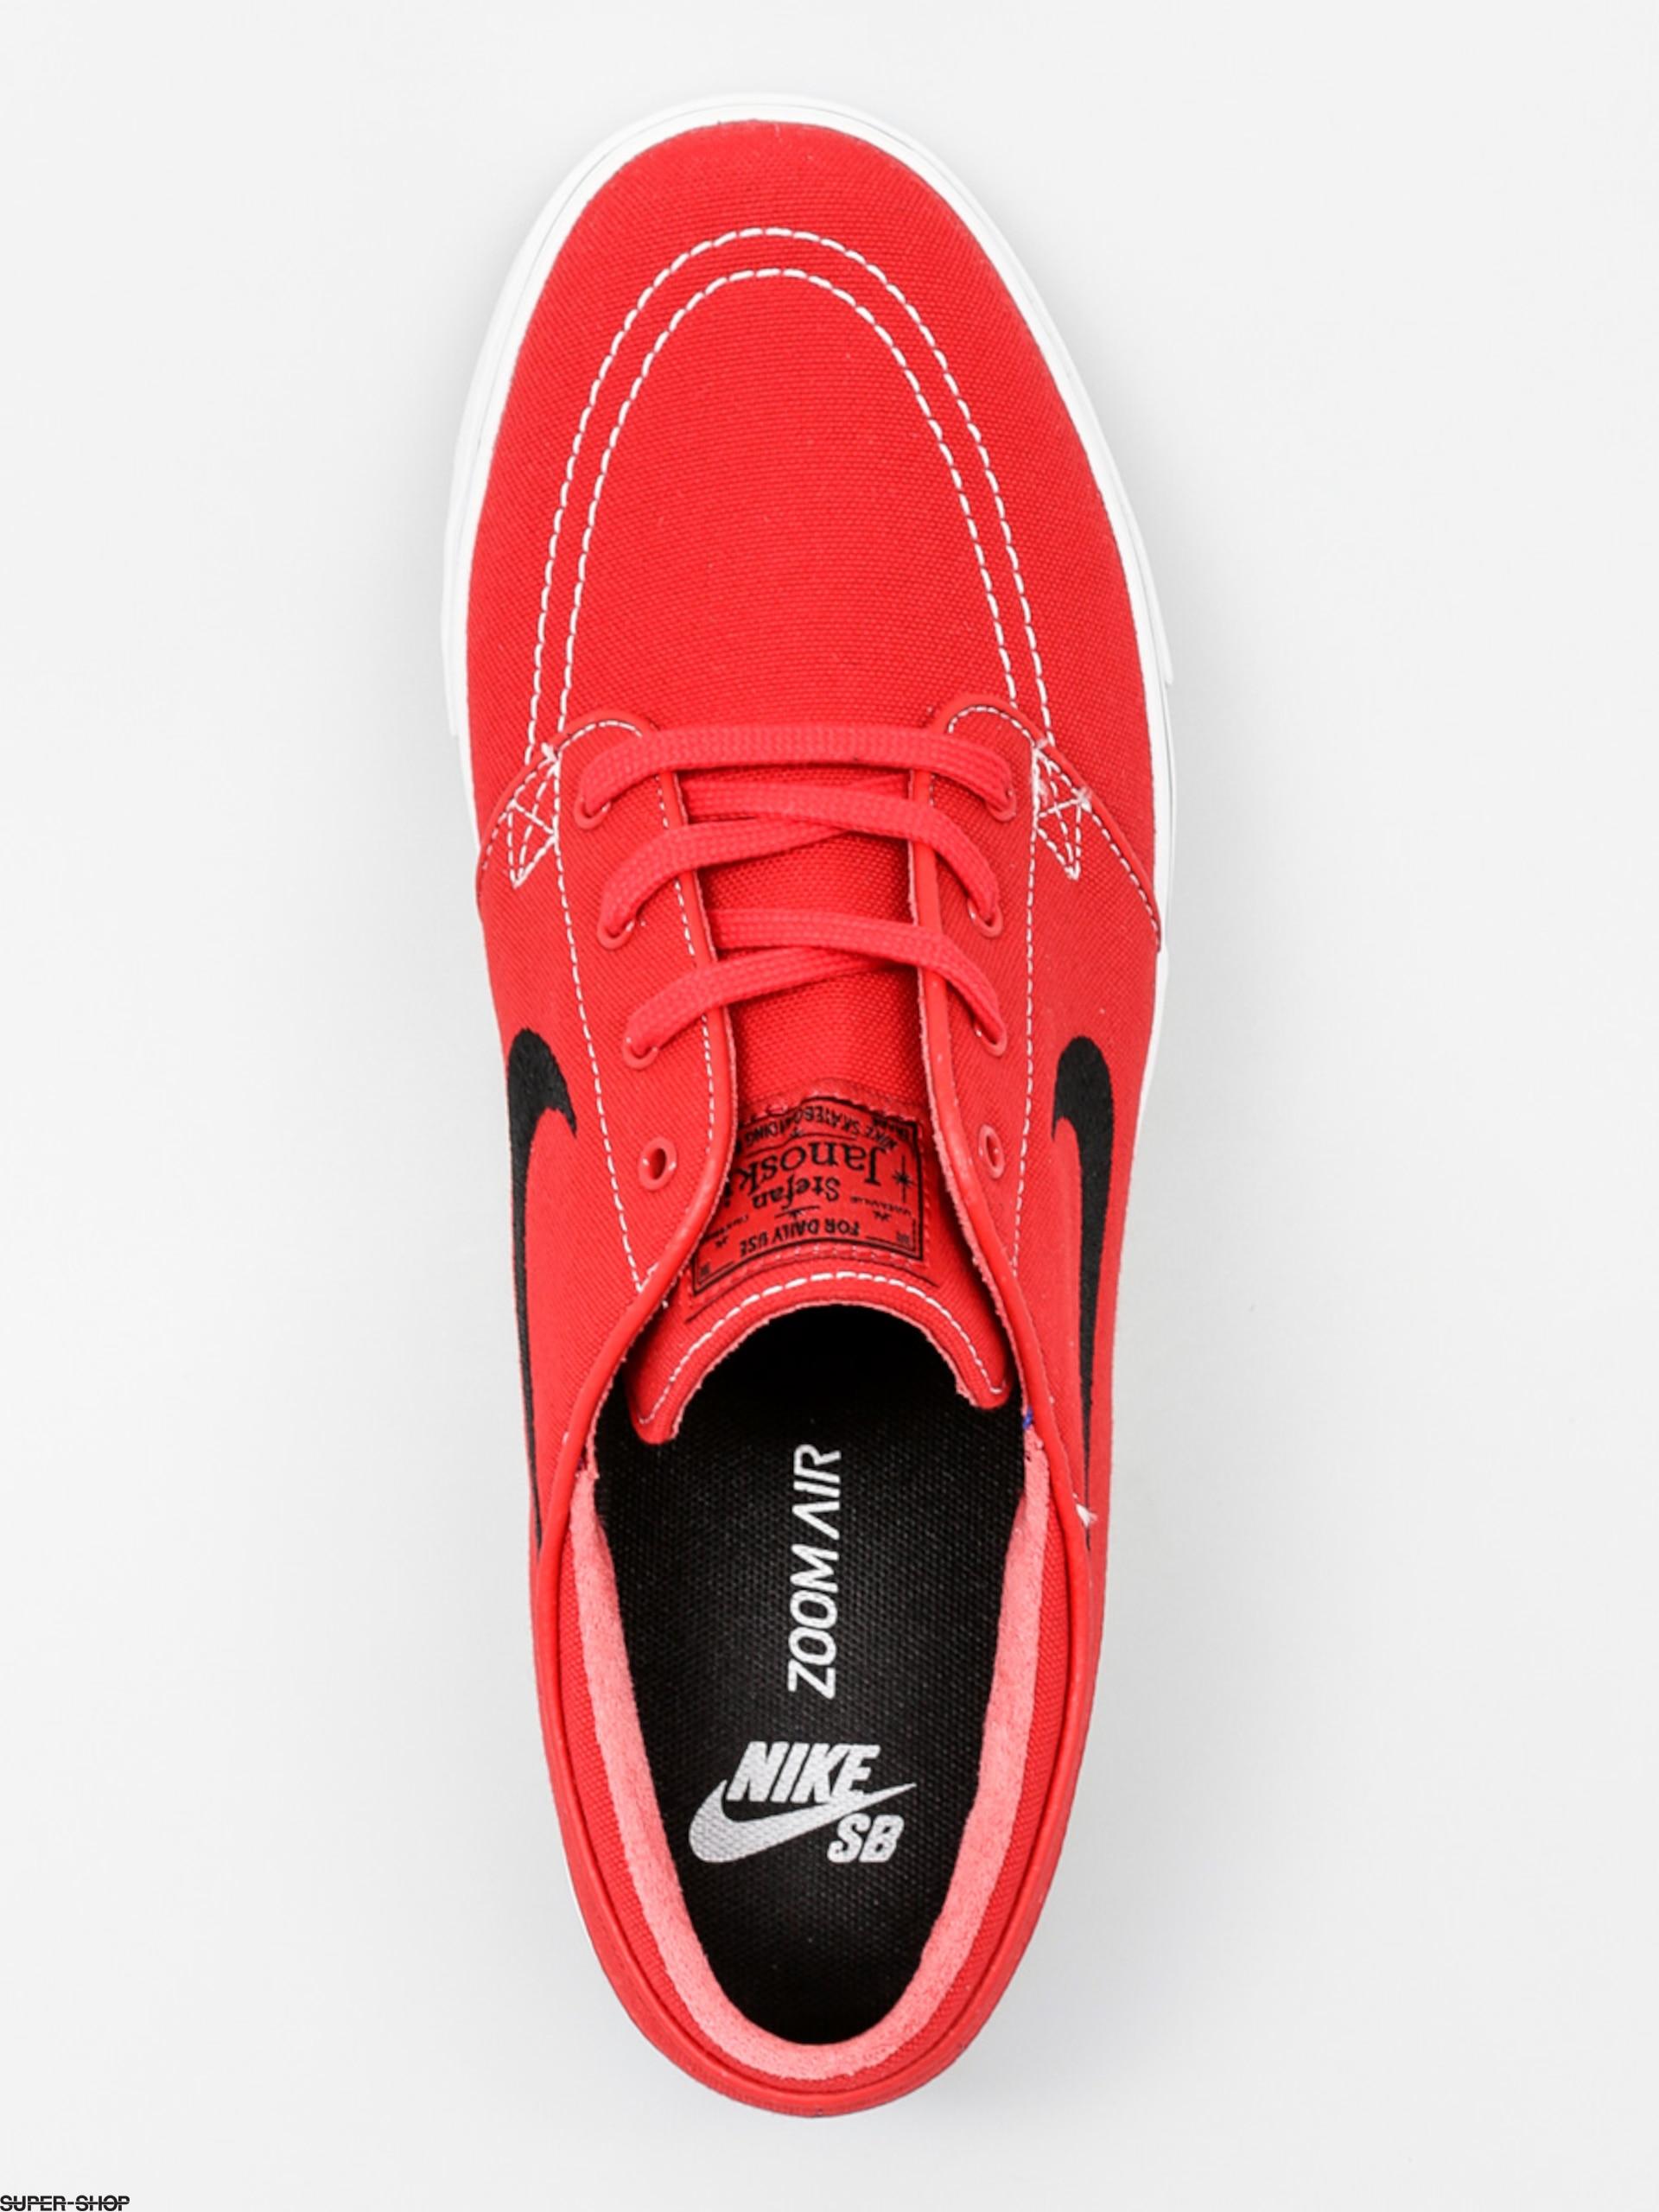 low priced aace5 d058c Nike SB Shoes Zoom Stefan Janoski Cnvs (unvrsty rd blk gm lght brwn wh)